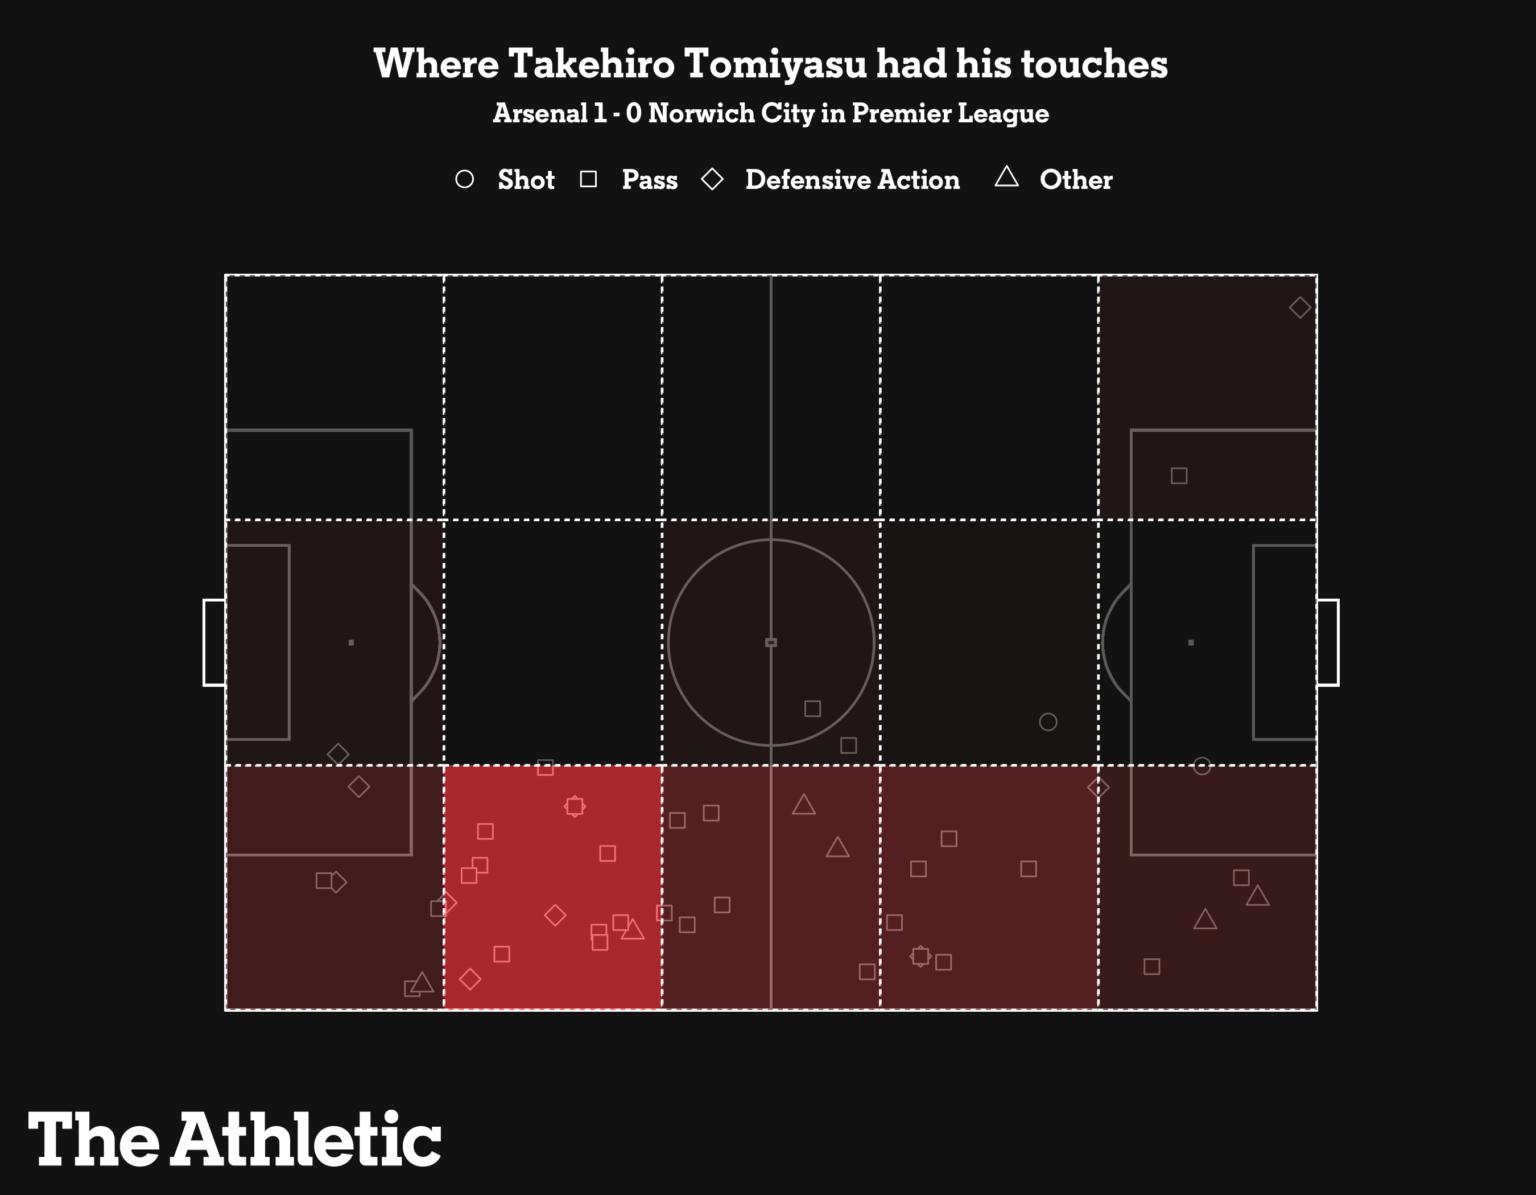 В фокусе: Такехиро Томиясу